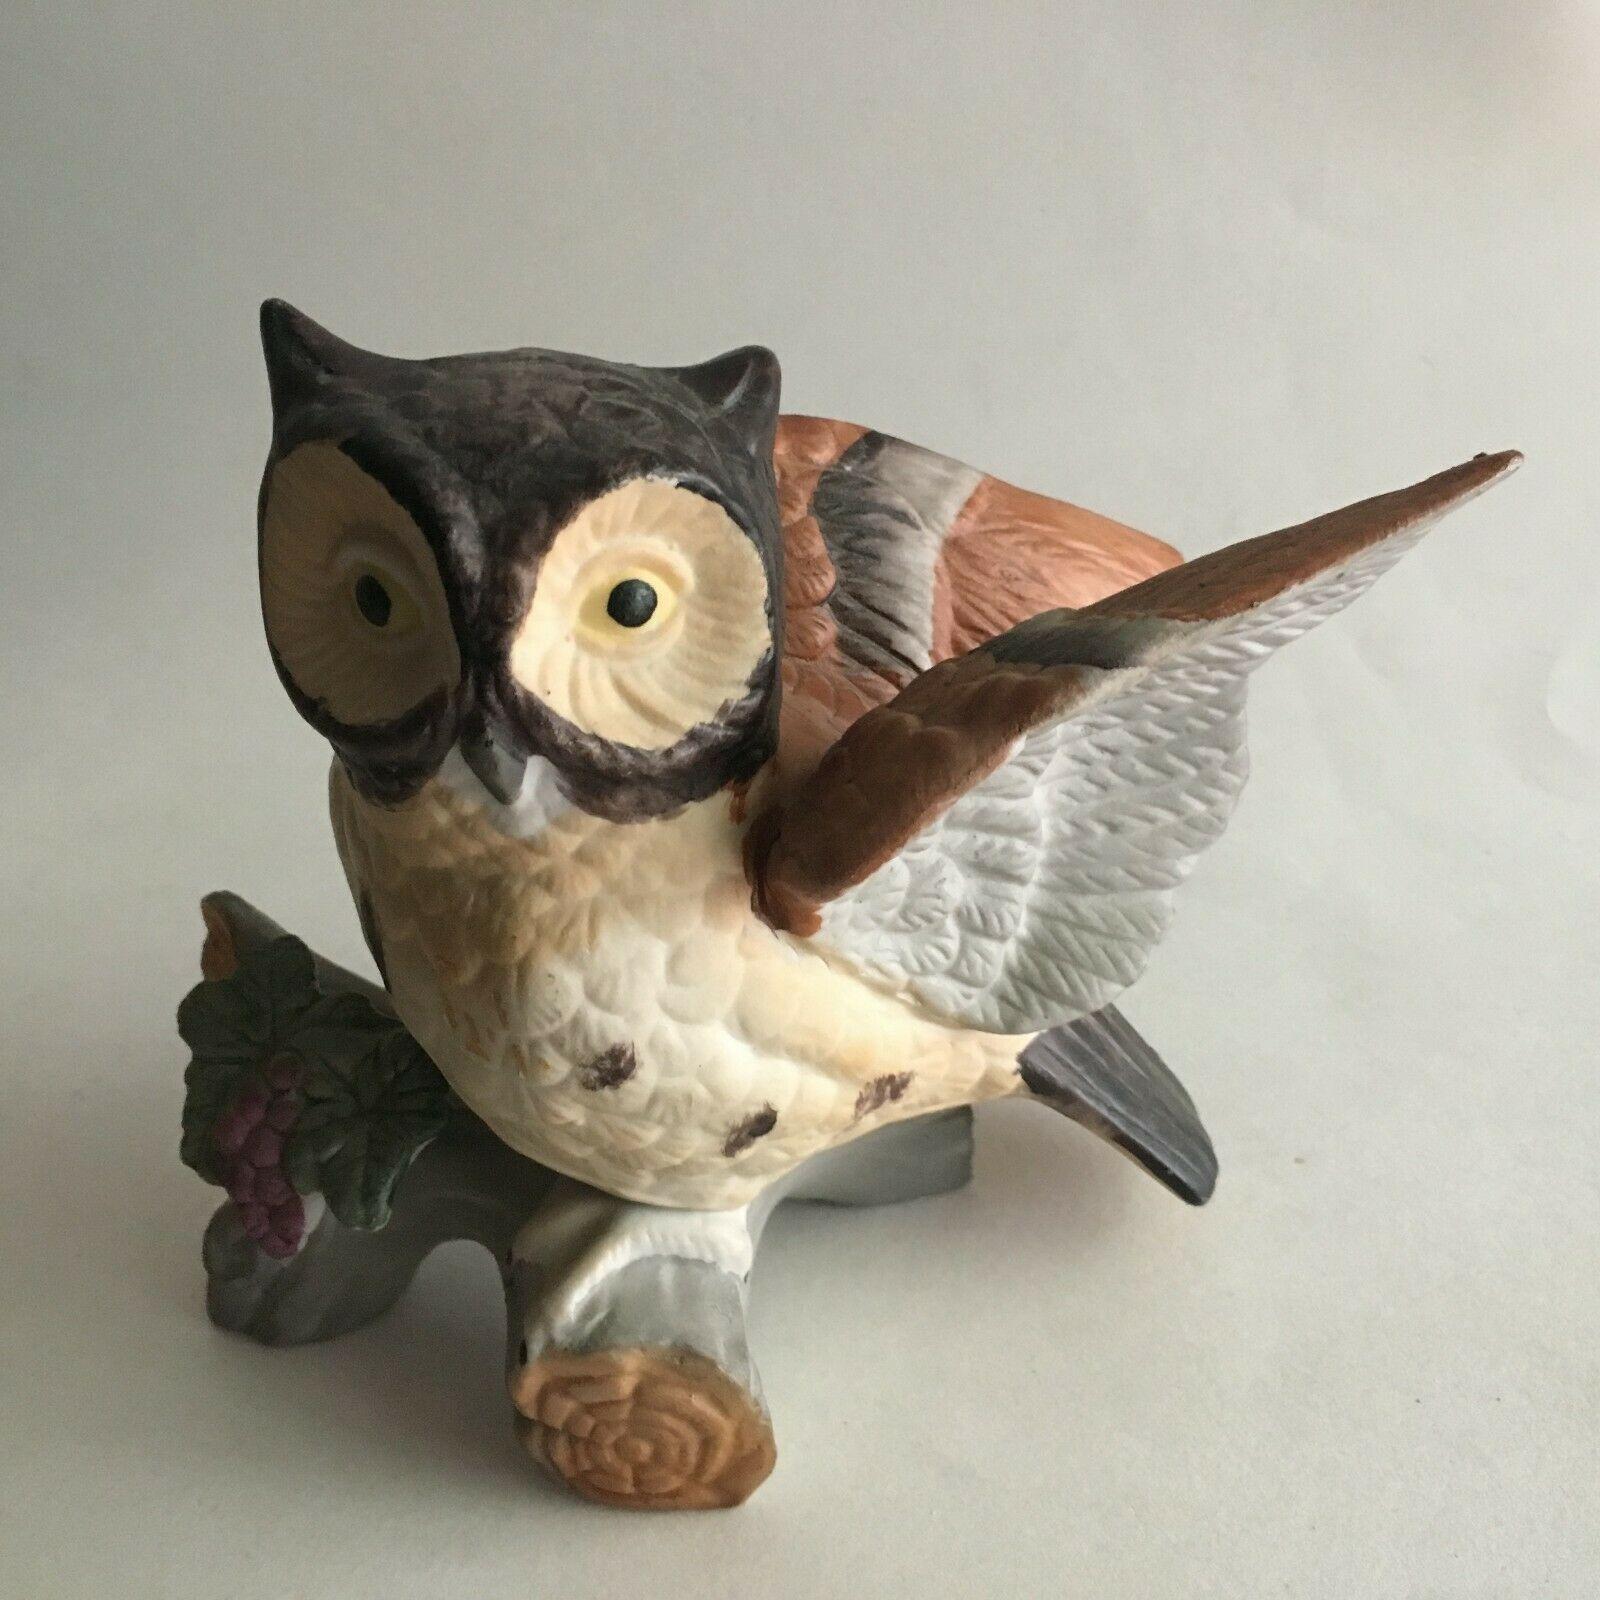 "Vintage Owl on Branch Ceramic Figurine Statue Collectible 6""X5""X3"" Mid Century"